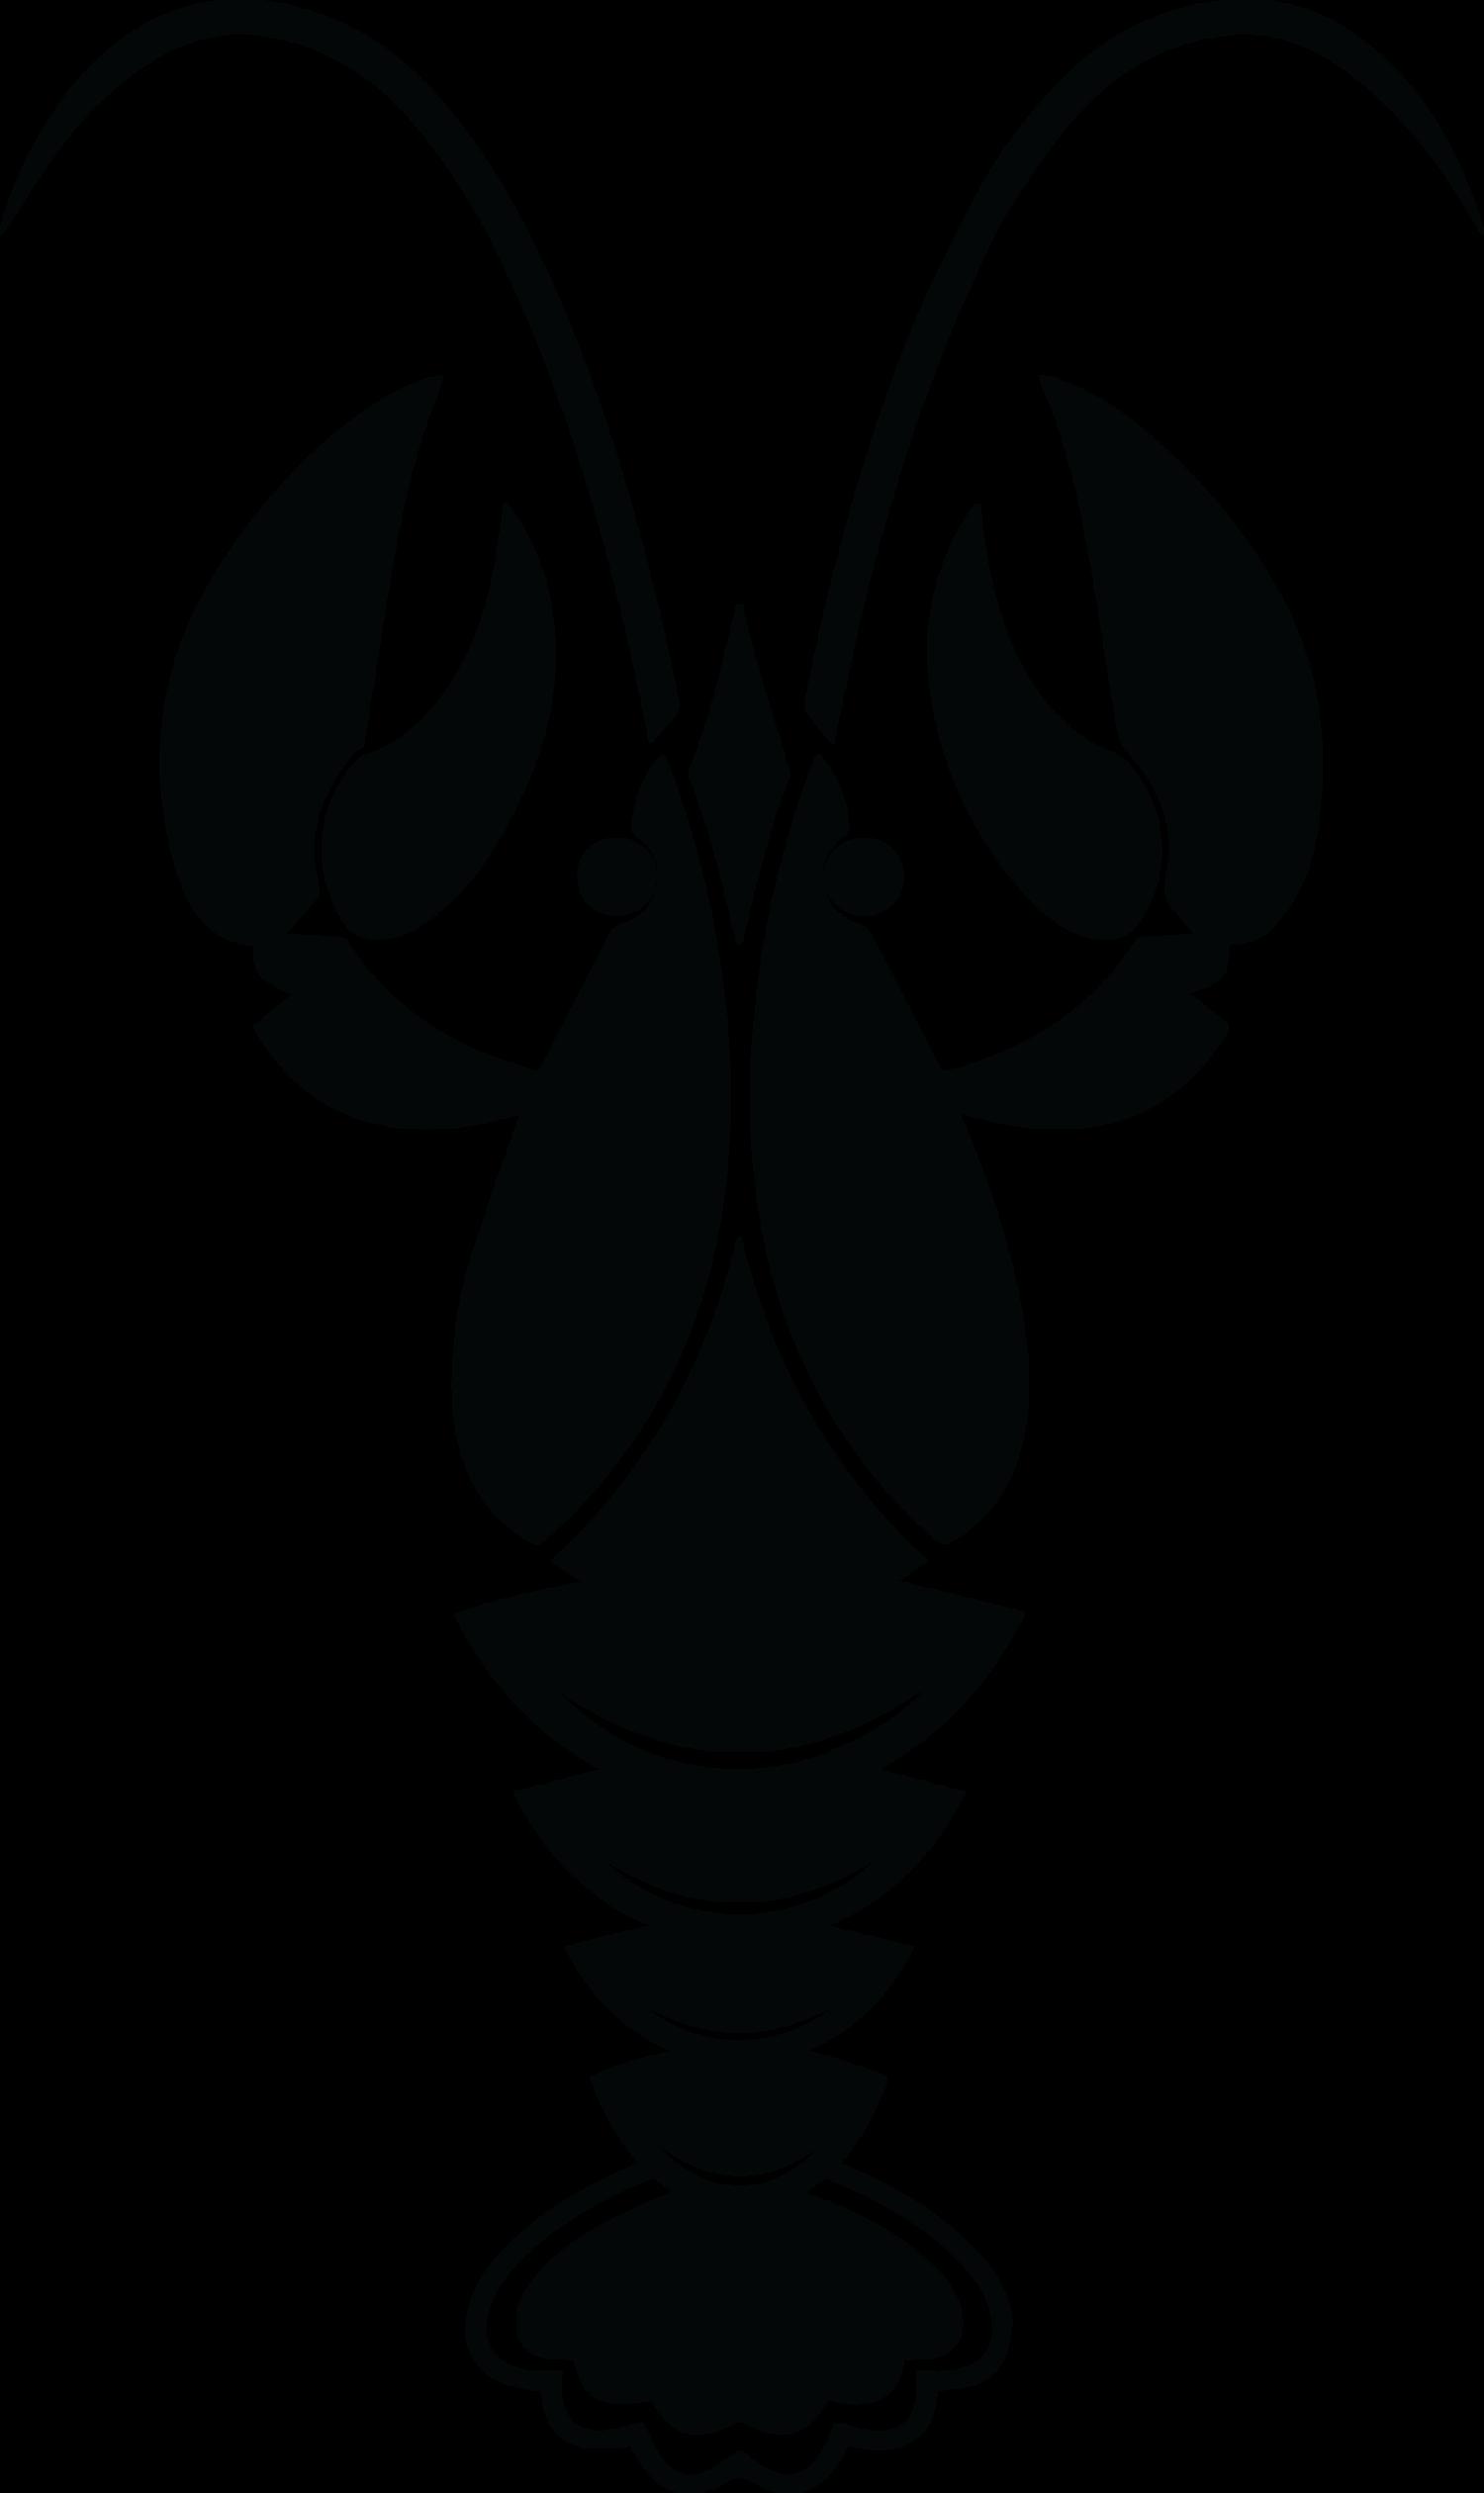 Crawfish clipart boiled crawfish. Crayfish procambarus clarkii royalty